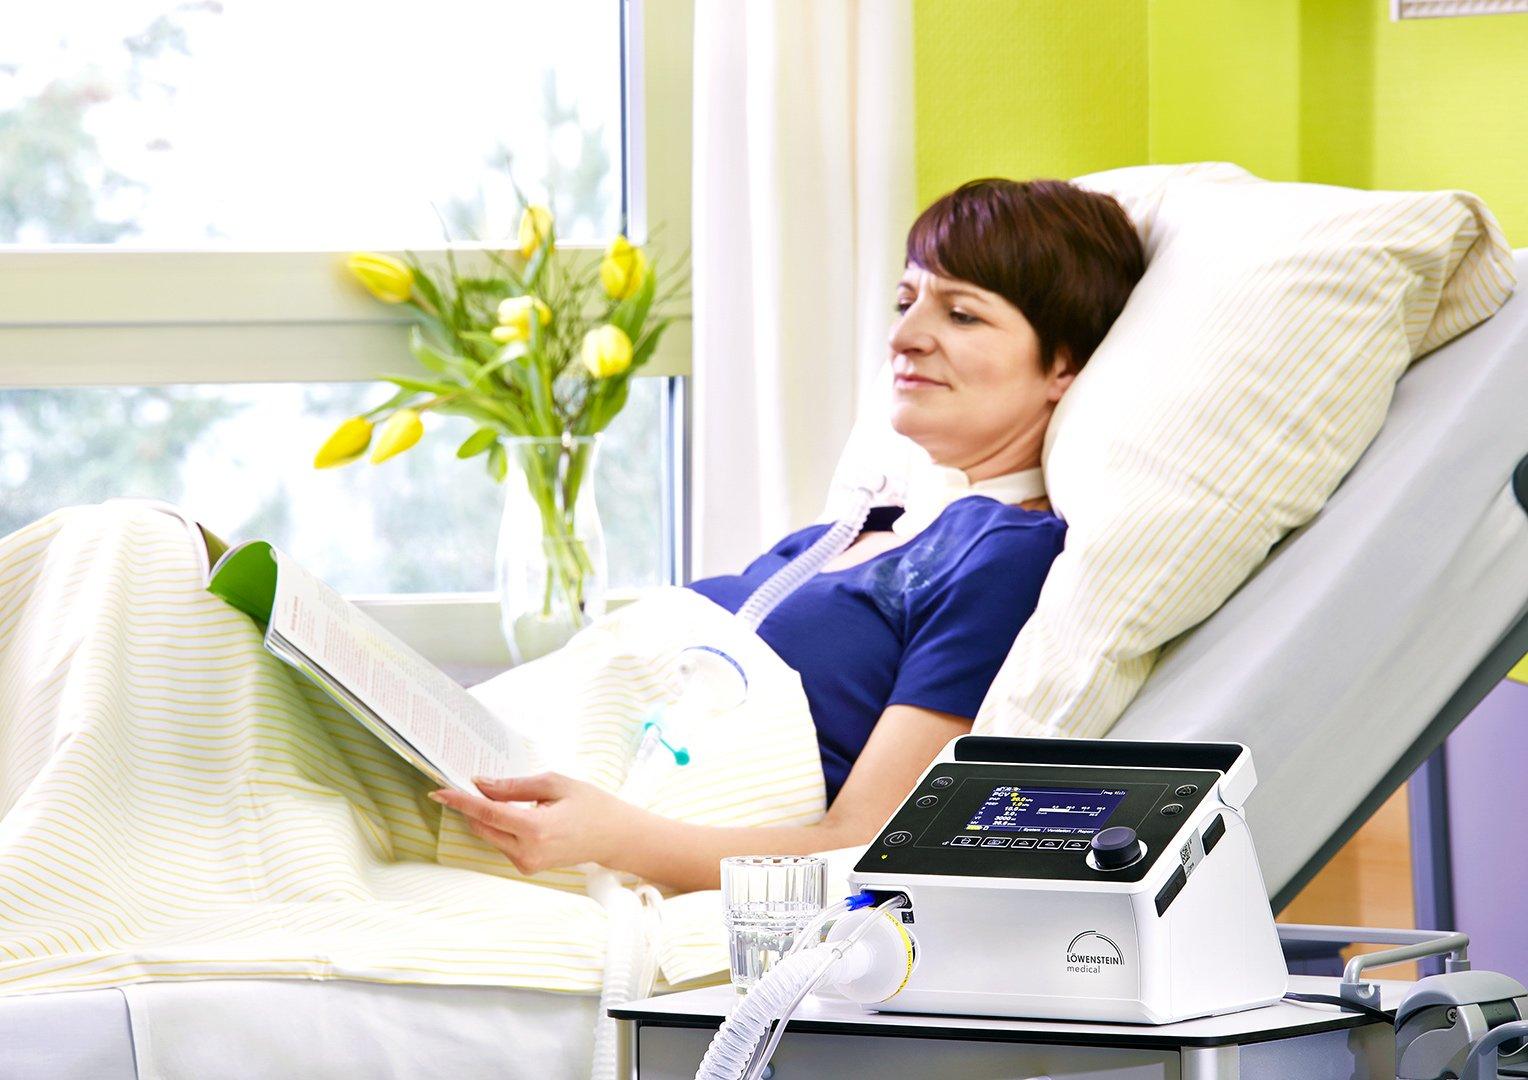 Аппарат ИВЛ Prisma VENT50 женщина лежит в кровати контур пациента вентиляция легких